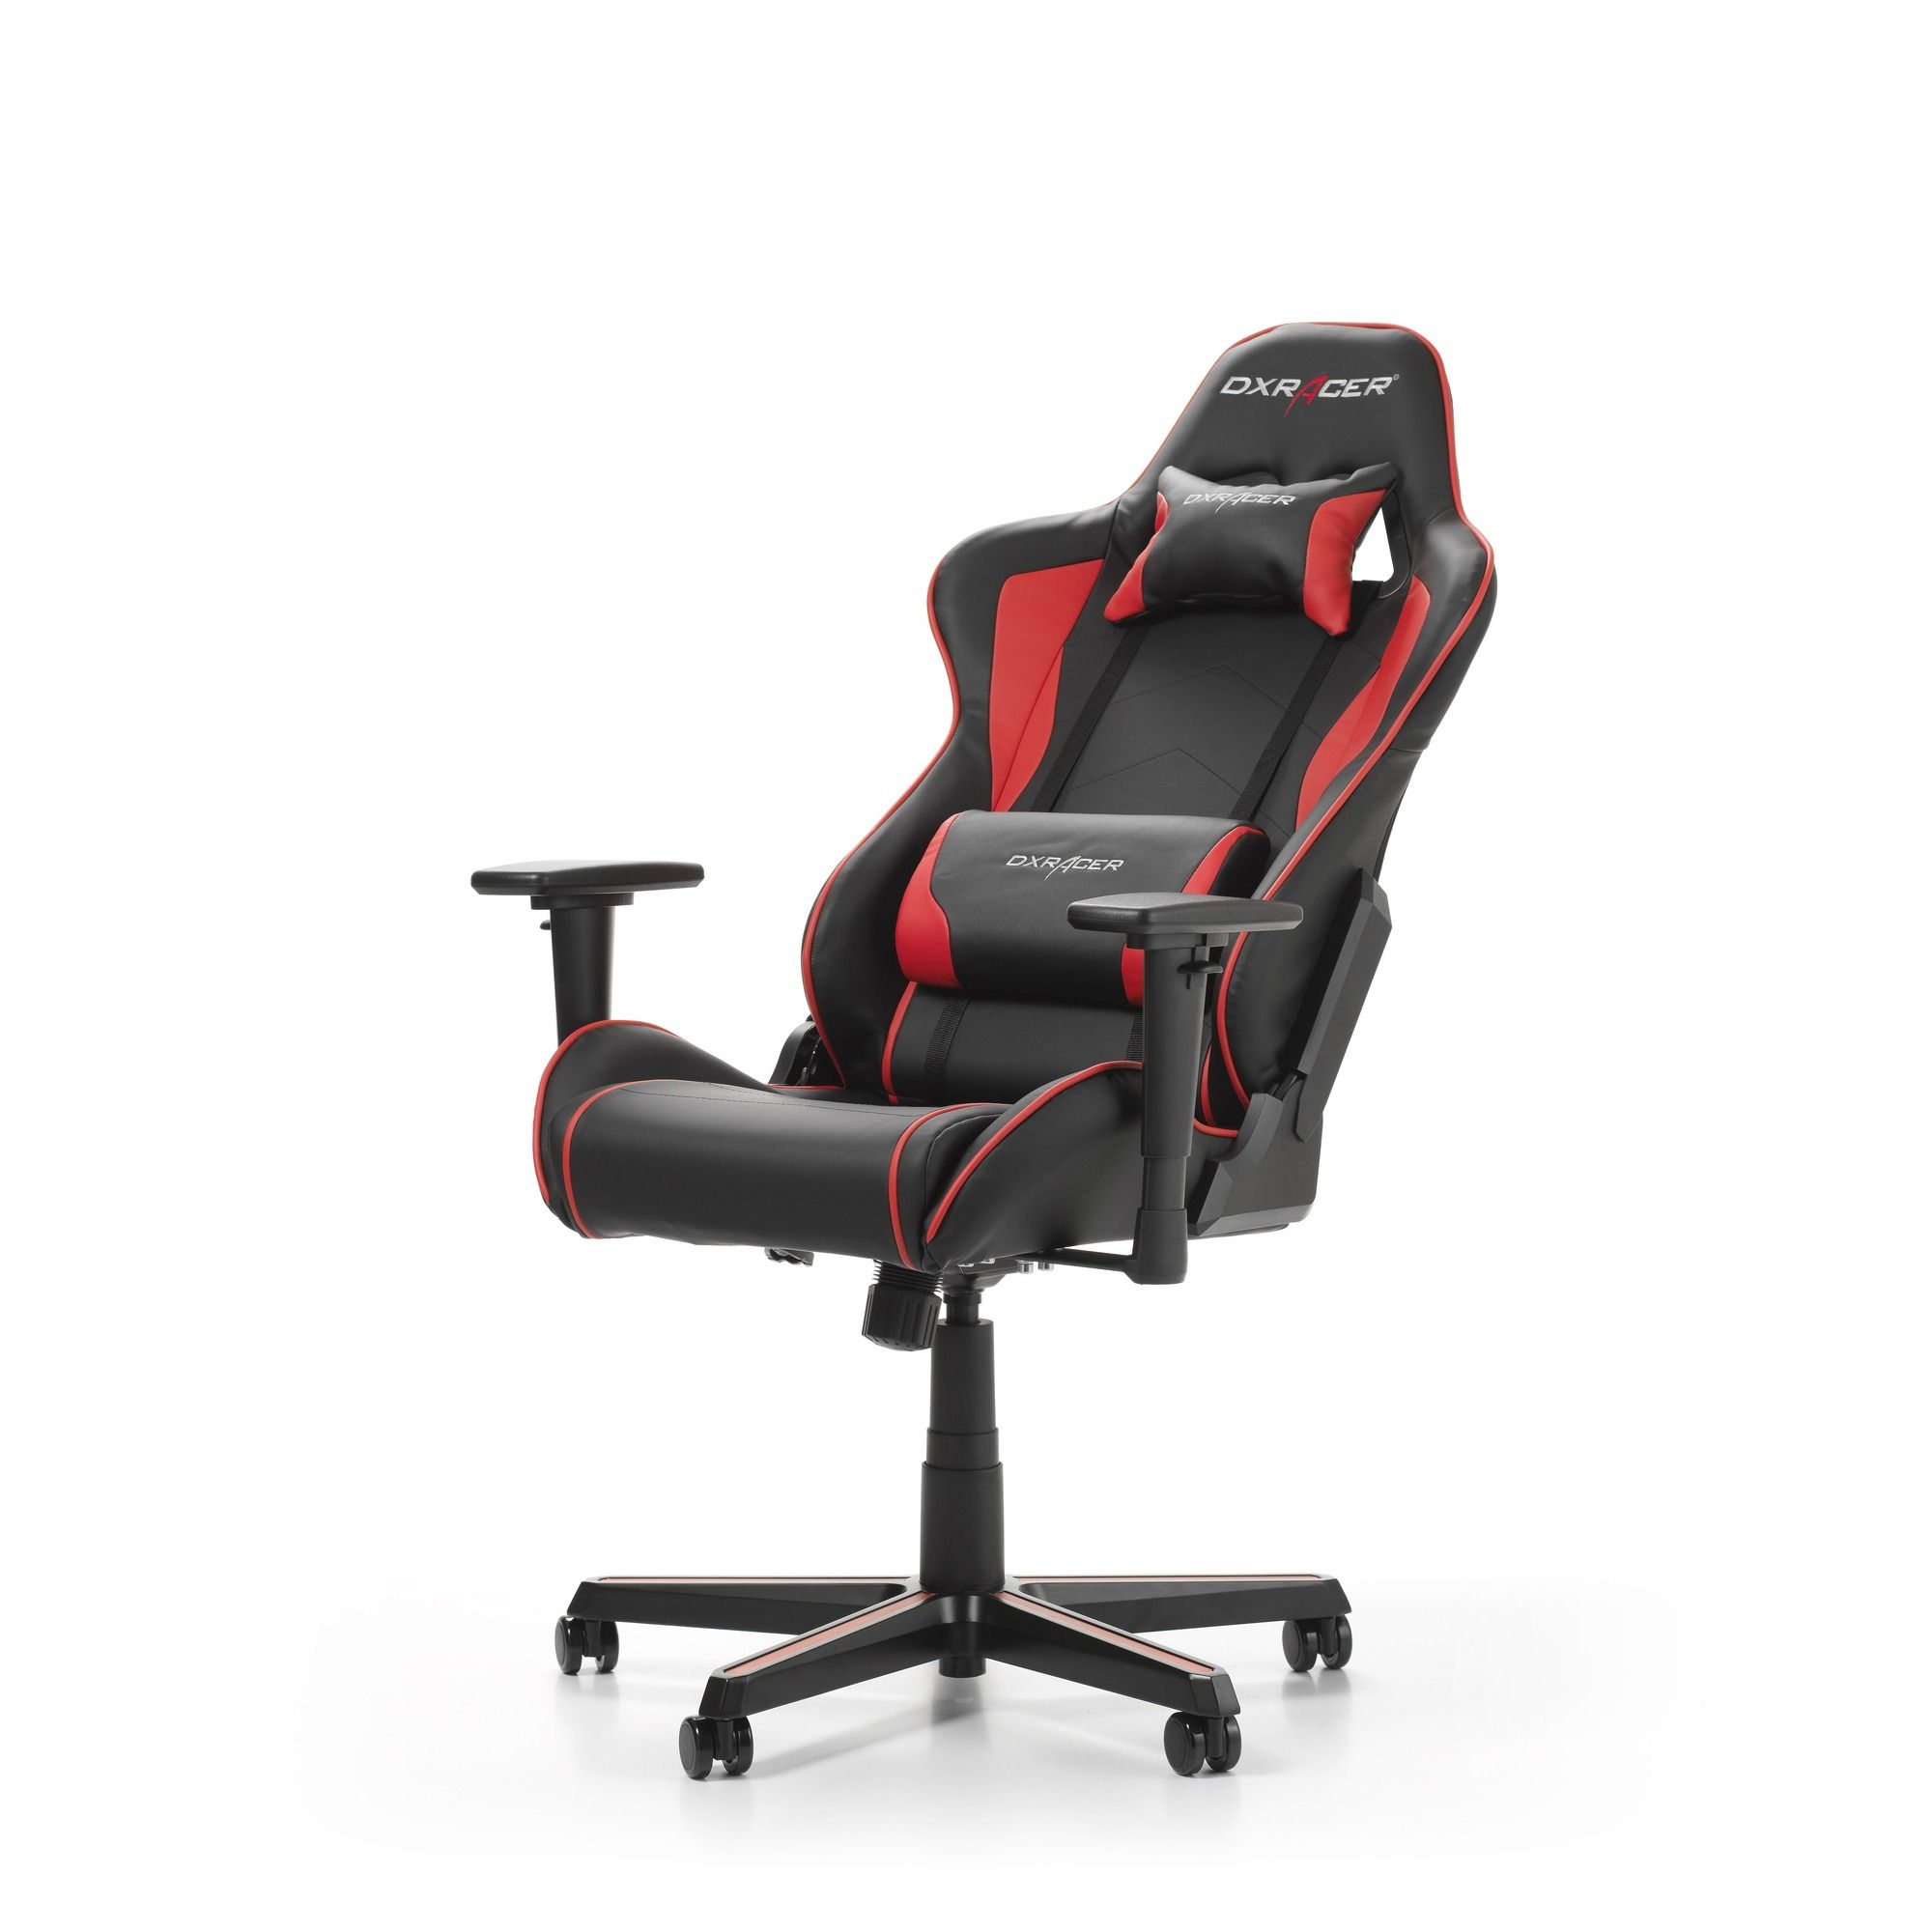 Гейминг стол DXRacer OH/FH08/NR - серия FORMULA, черен/червен - 4